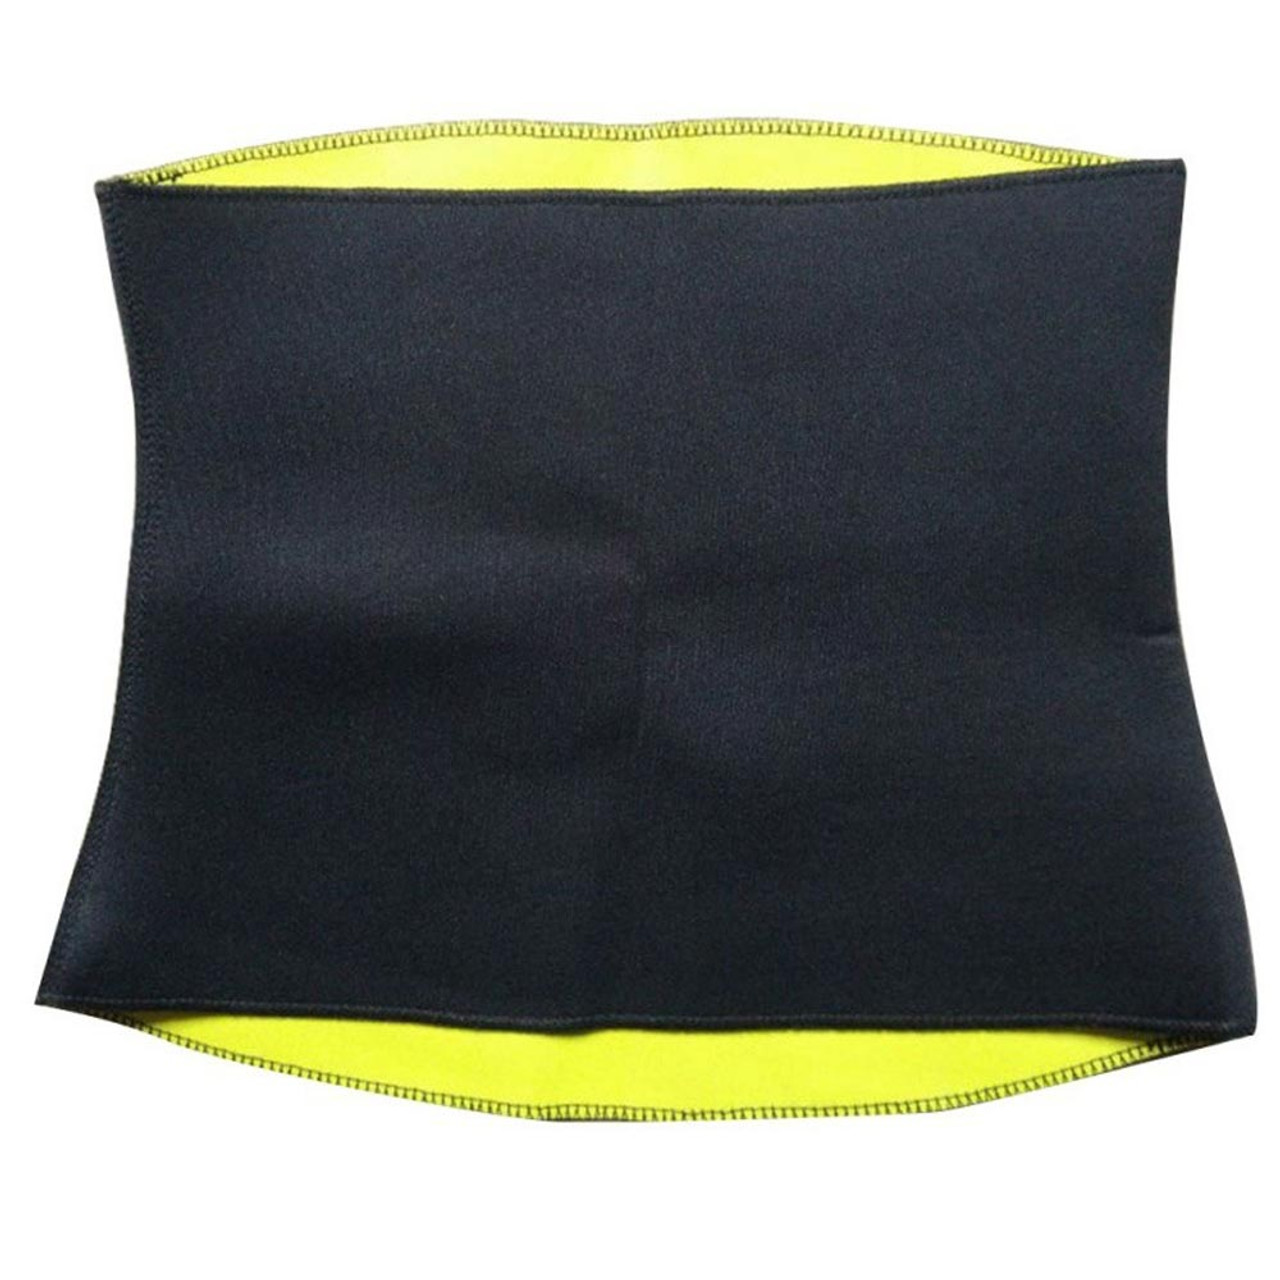 86e361962b7 Neoprene Belt Hot Neoprene Gym Waist Trainer Shaper Sweat Slimming Belt  Waist Cincher Girdle Weight Loss Women   Men FREE Shipping. -  www.kaneesha.com